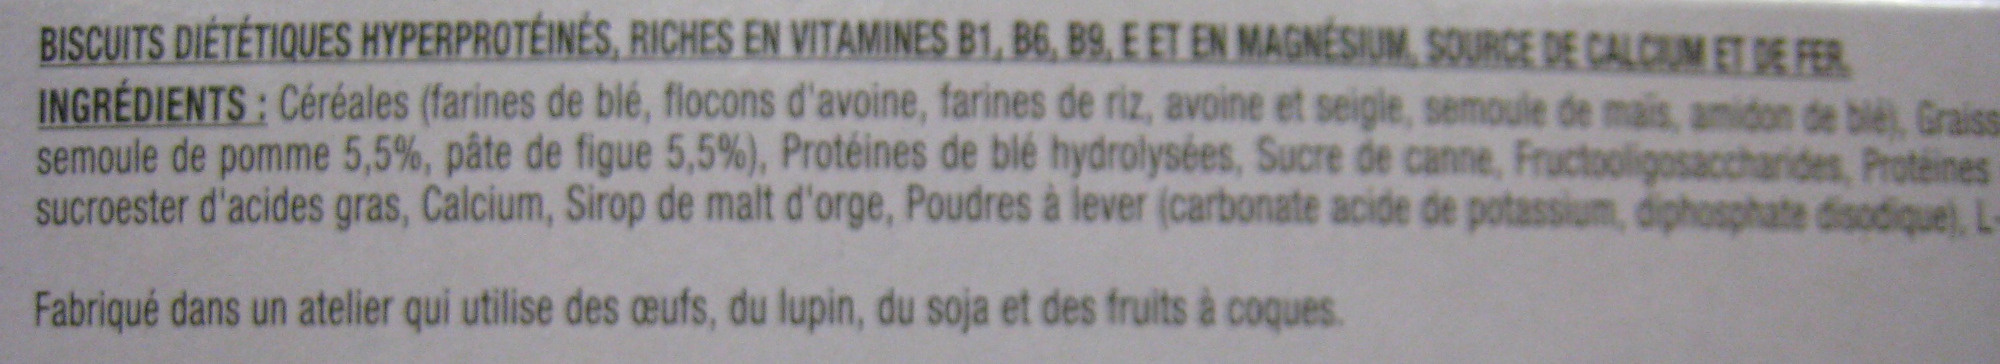 Biscuits saveur pomme figue - Ingrédients